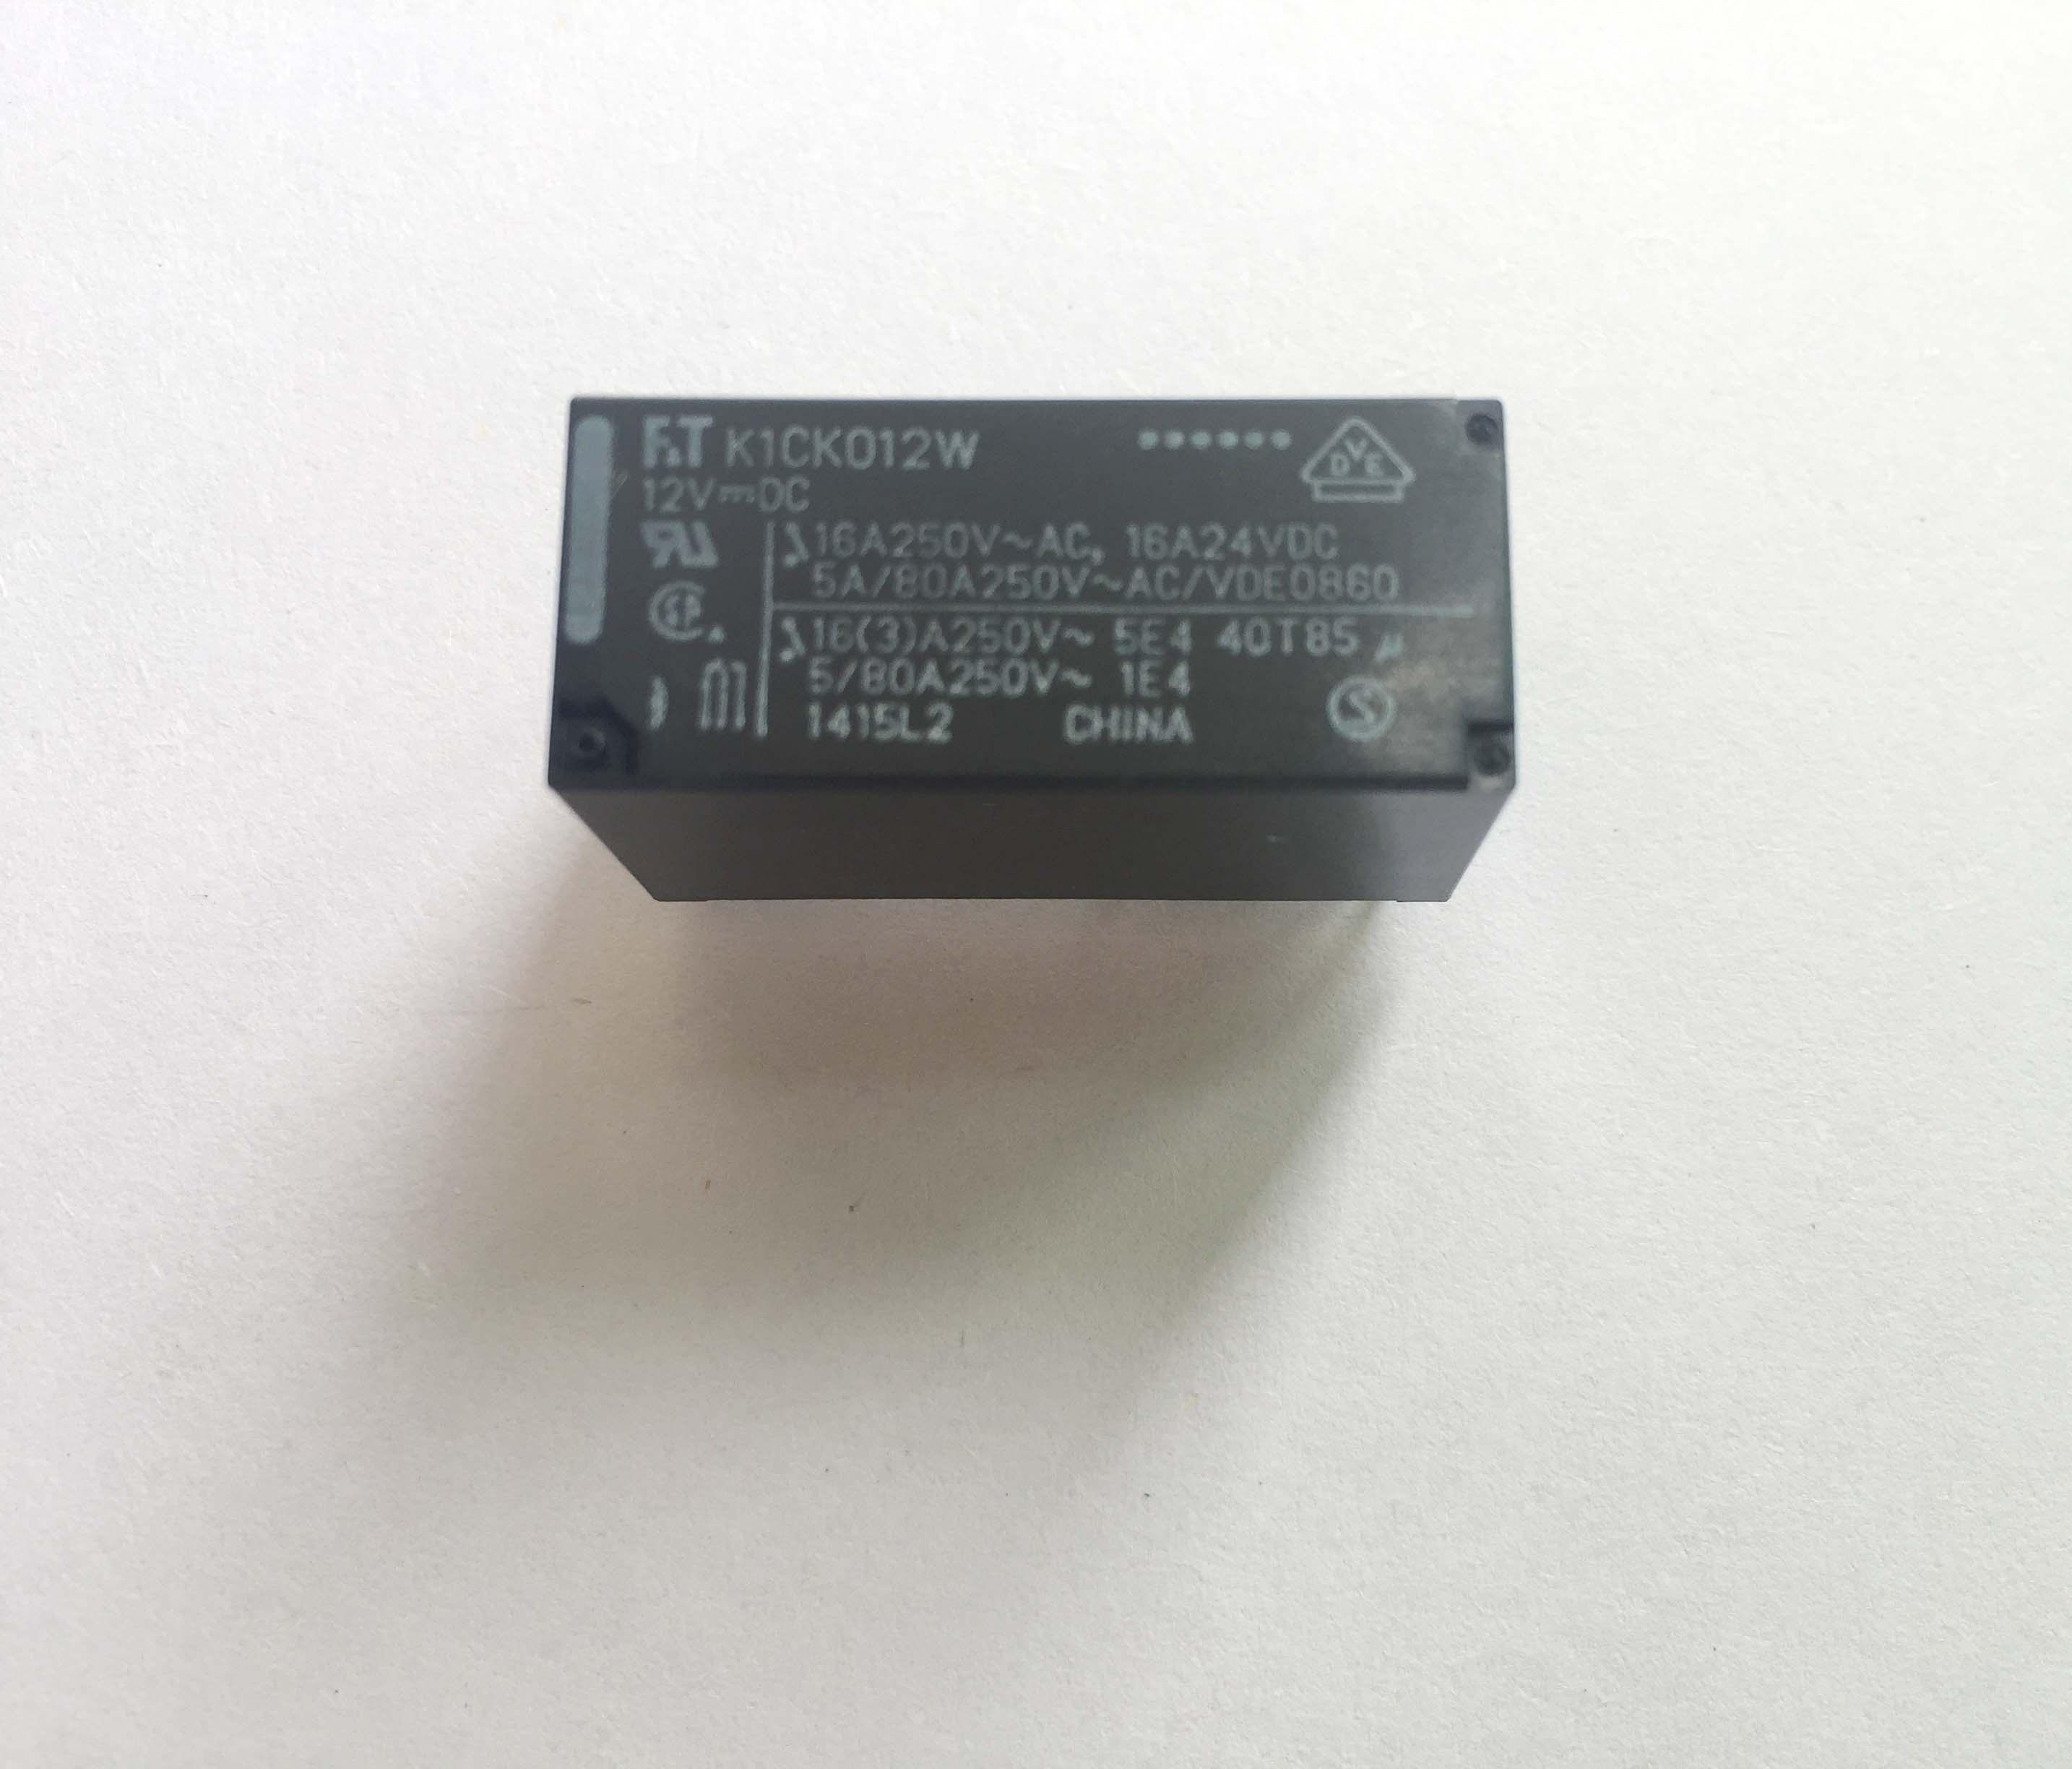 FTR-K1CK012W K1CK012W Power Relay 16A 12VDC 8 Pins x 2PCS NEW